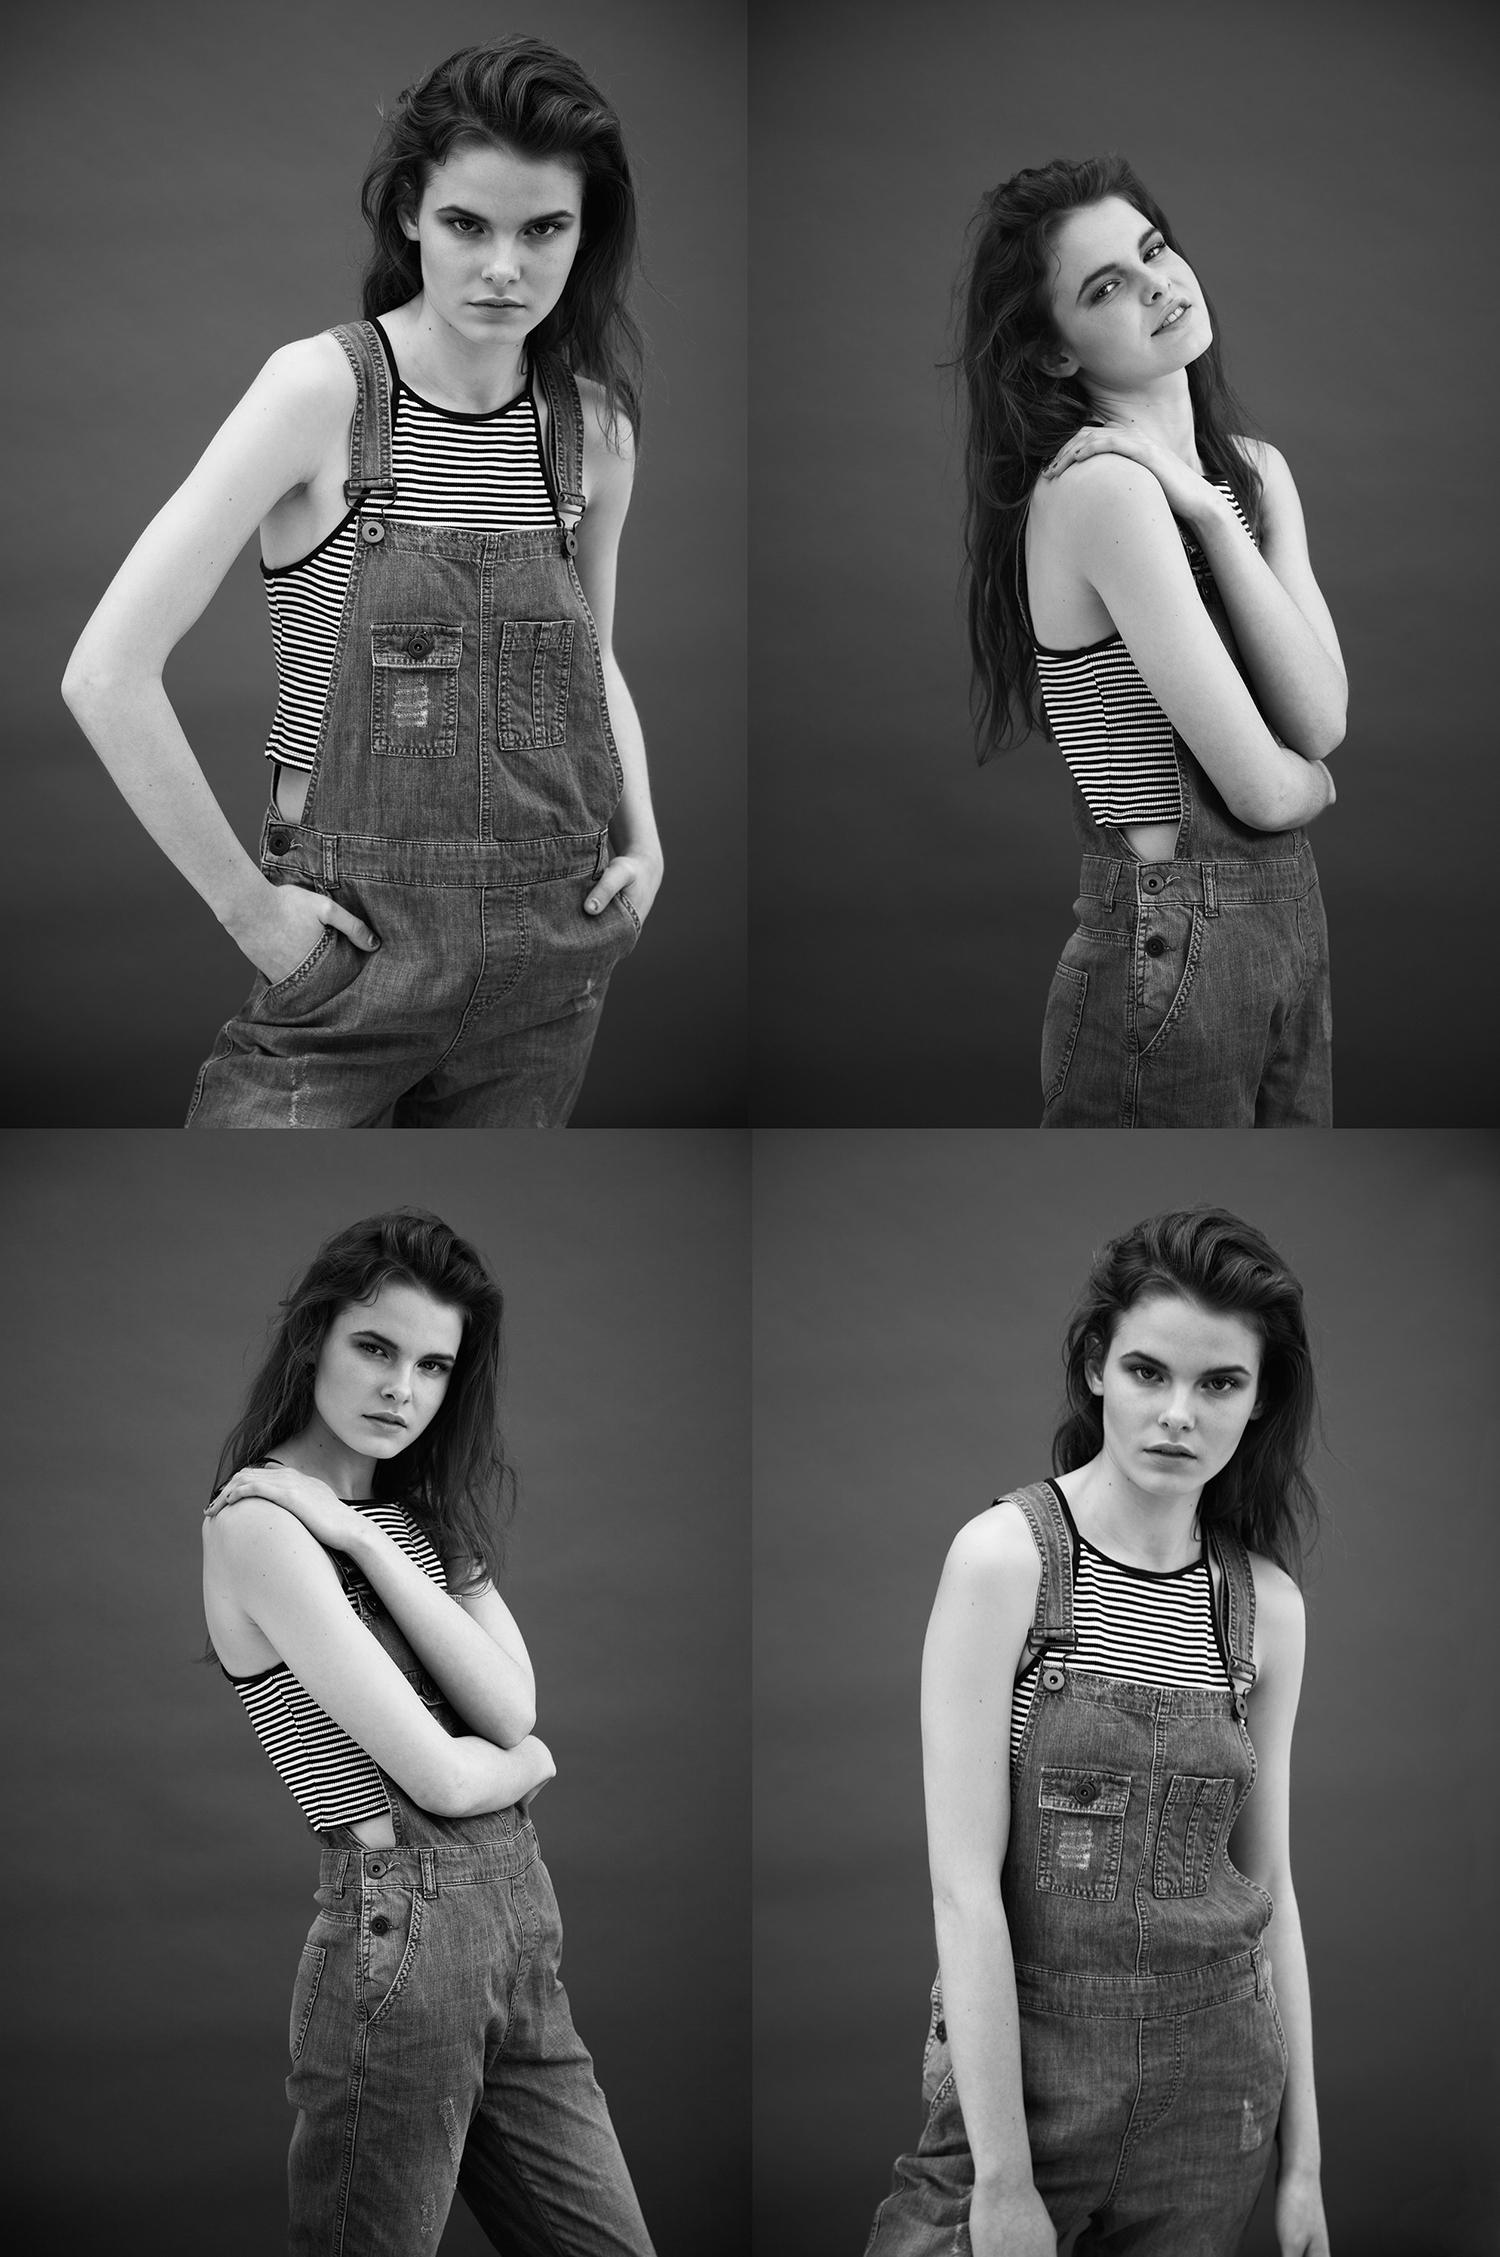 181Sophia_Kahlenberg_FashionPortraits_164.jpg